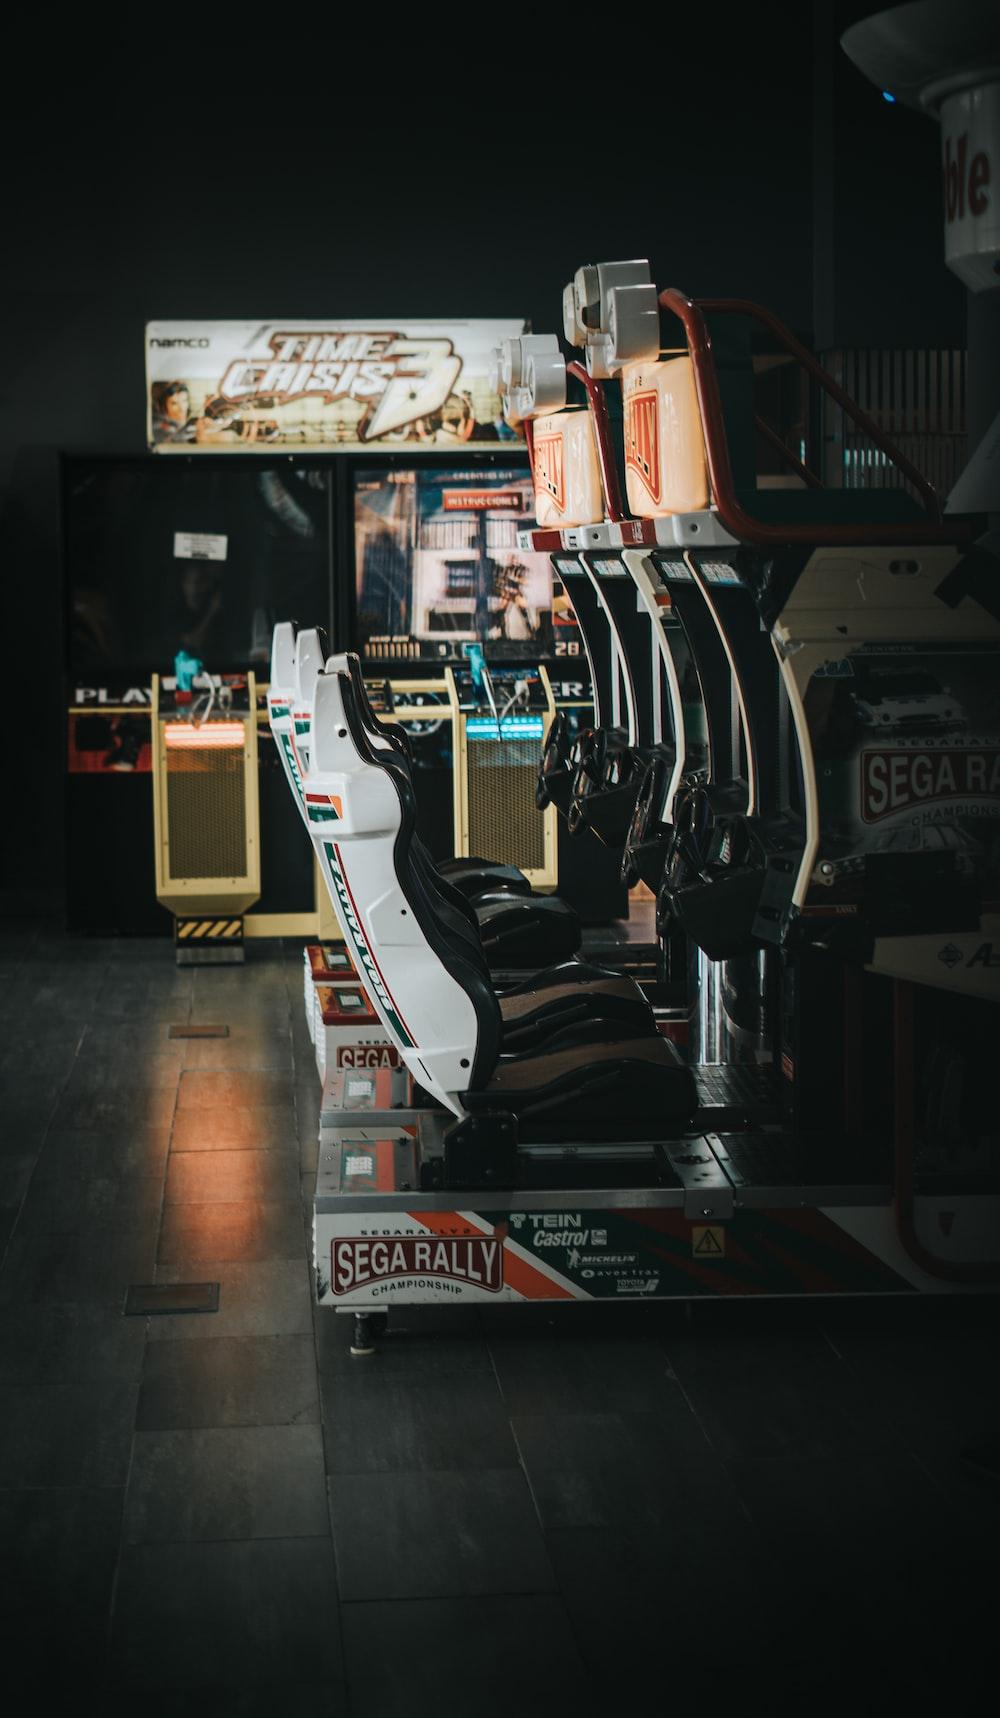 empty video game arcade